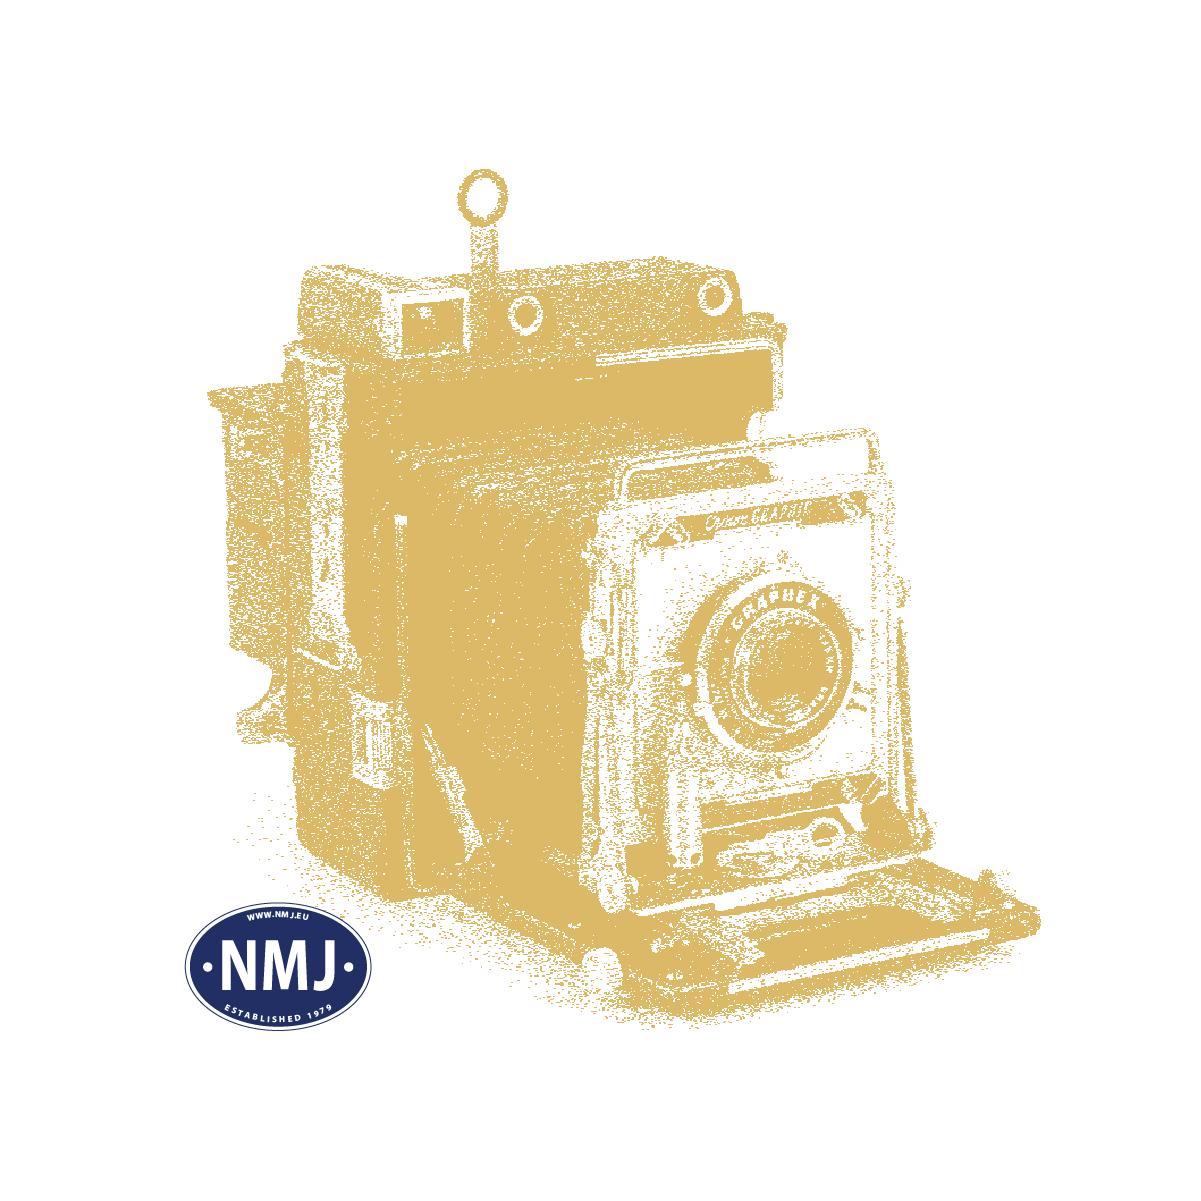 NMJT95103 - NMJ Topline MY 1148 der DSB, AC Digital